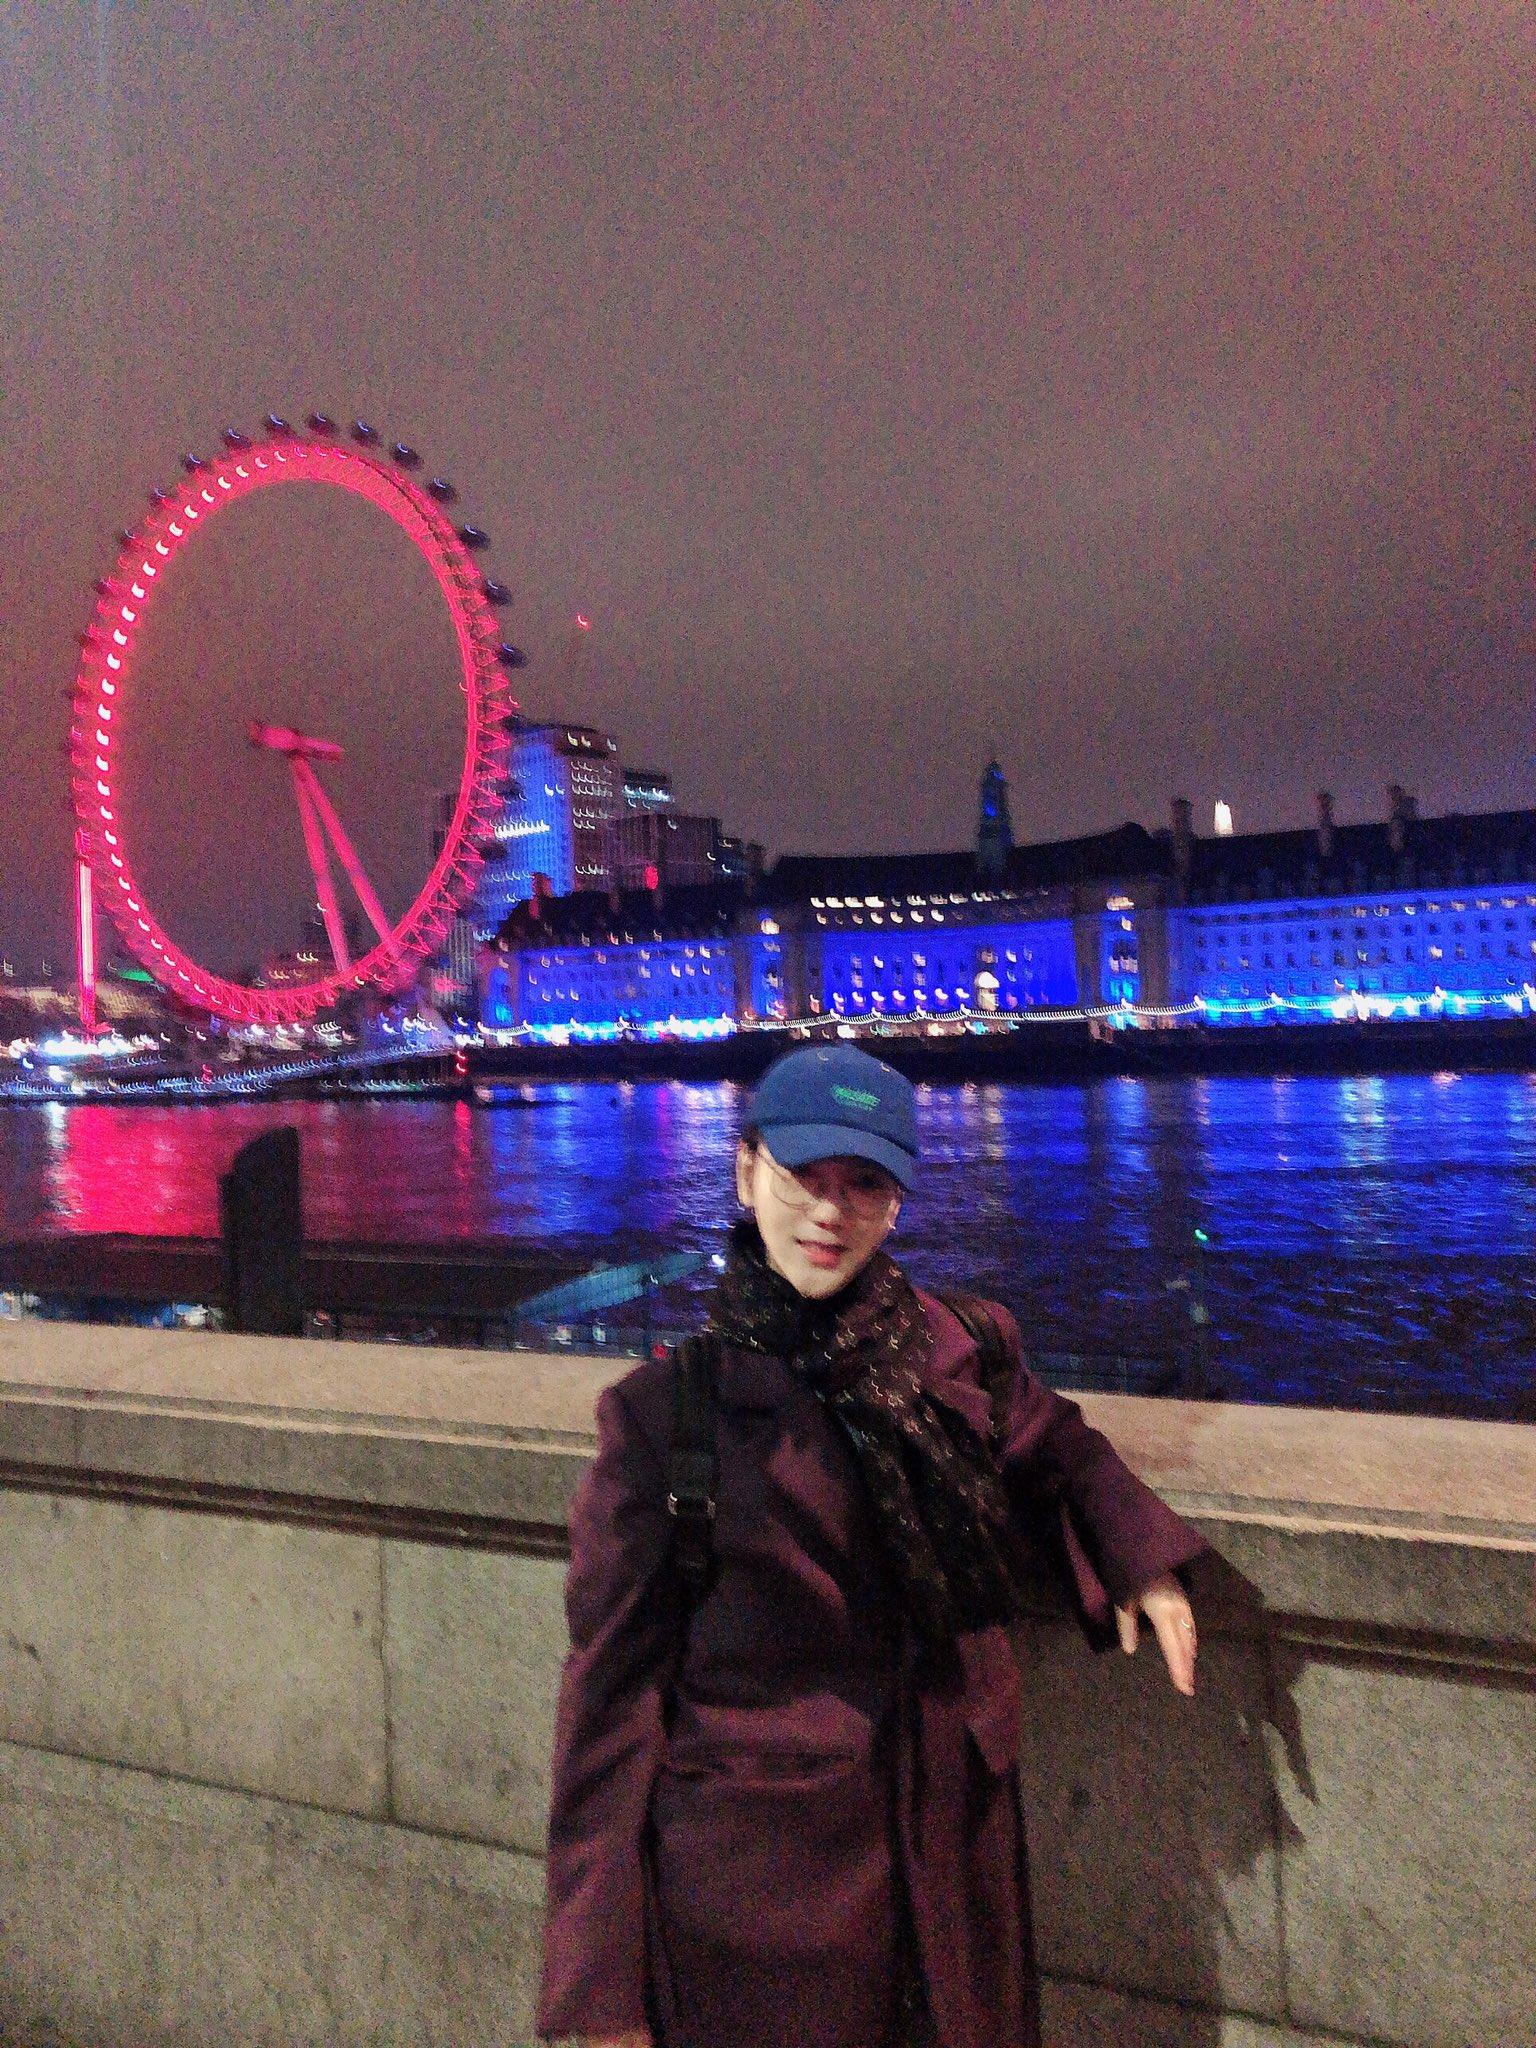 Thames River , Tower Bridge , Tate Modern , Millennium Bridge , Saint Paul's Cathedral , Big Ben �������������� https://t.co/oyesfQF42T